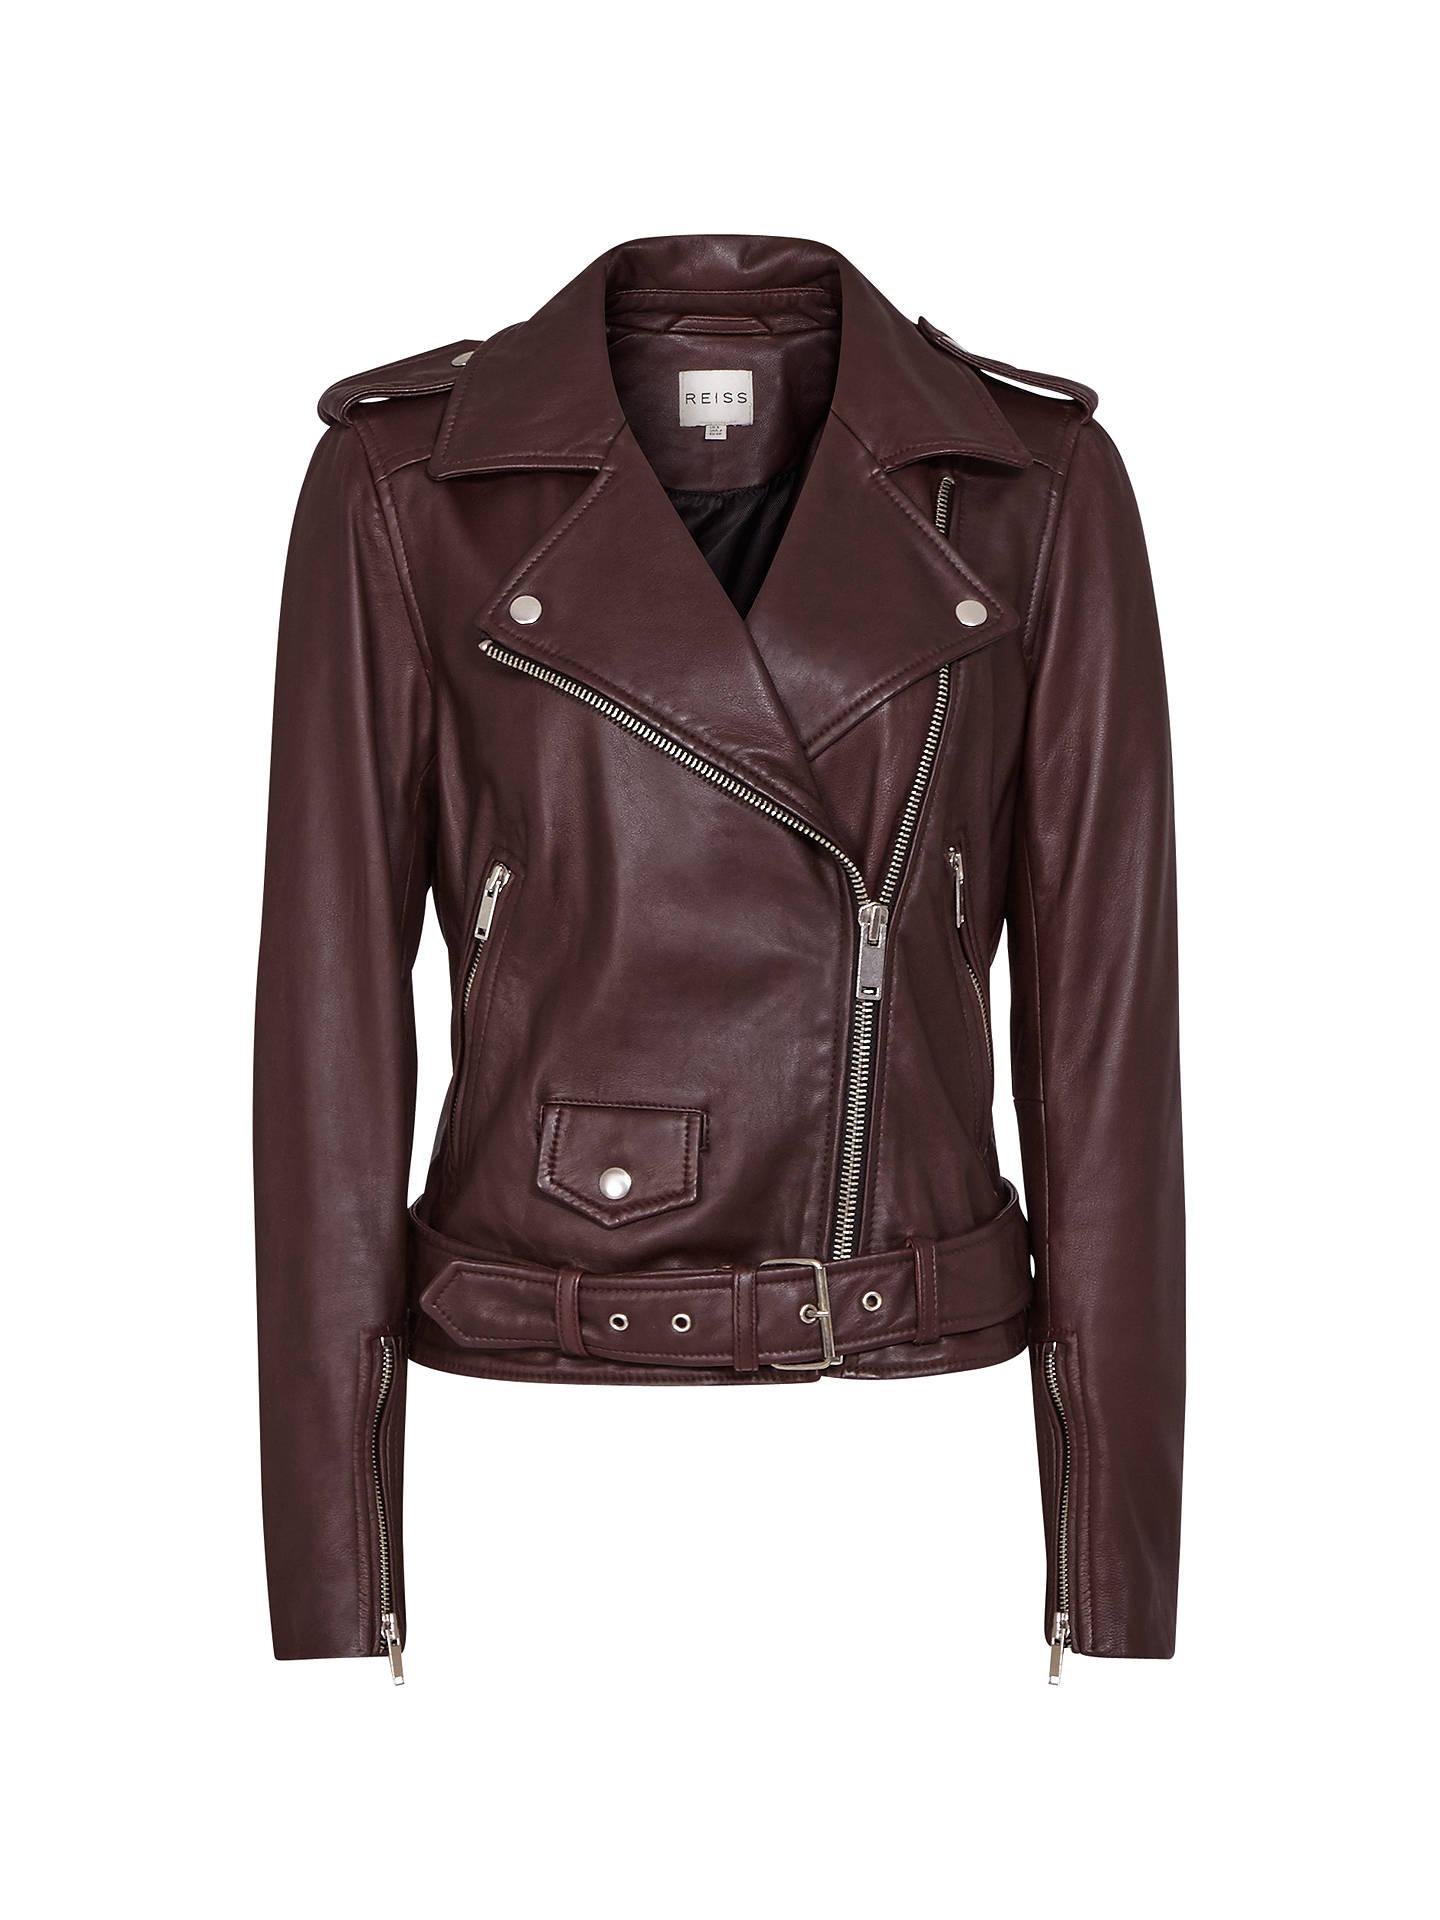 Reiss Belt Detail Leather Biker Jacket Ox Blood 6 Online At Johnlewis